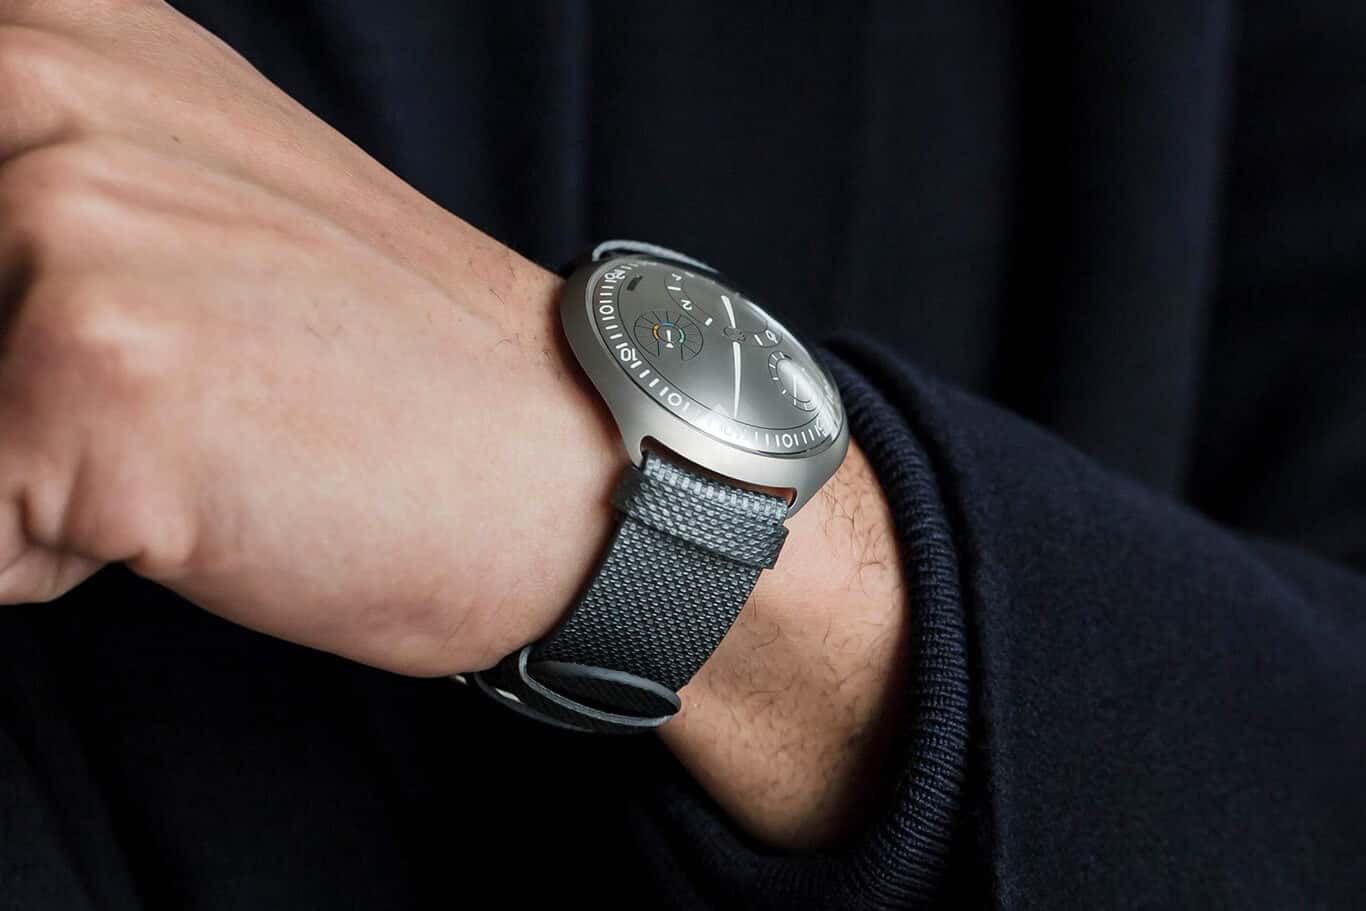 ressence Type 2 e Crown Concept smartwatch concept image 02